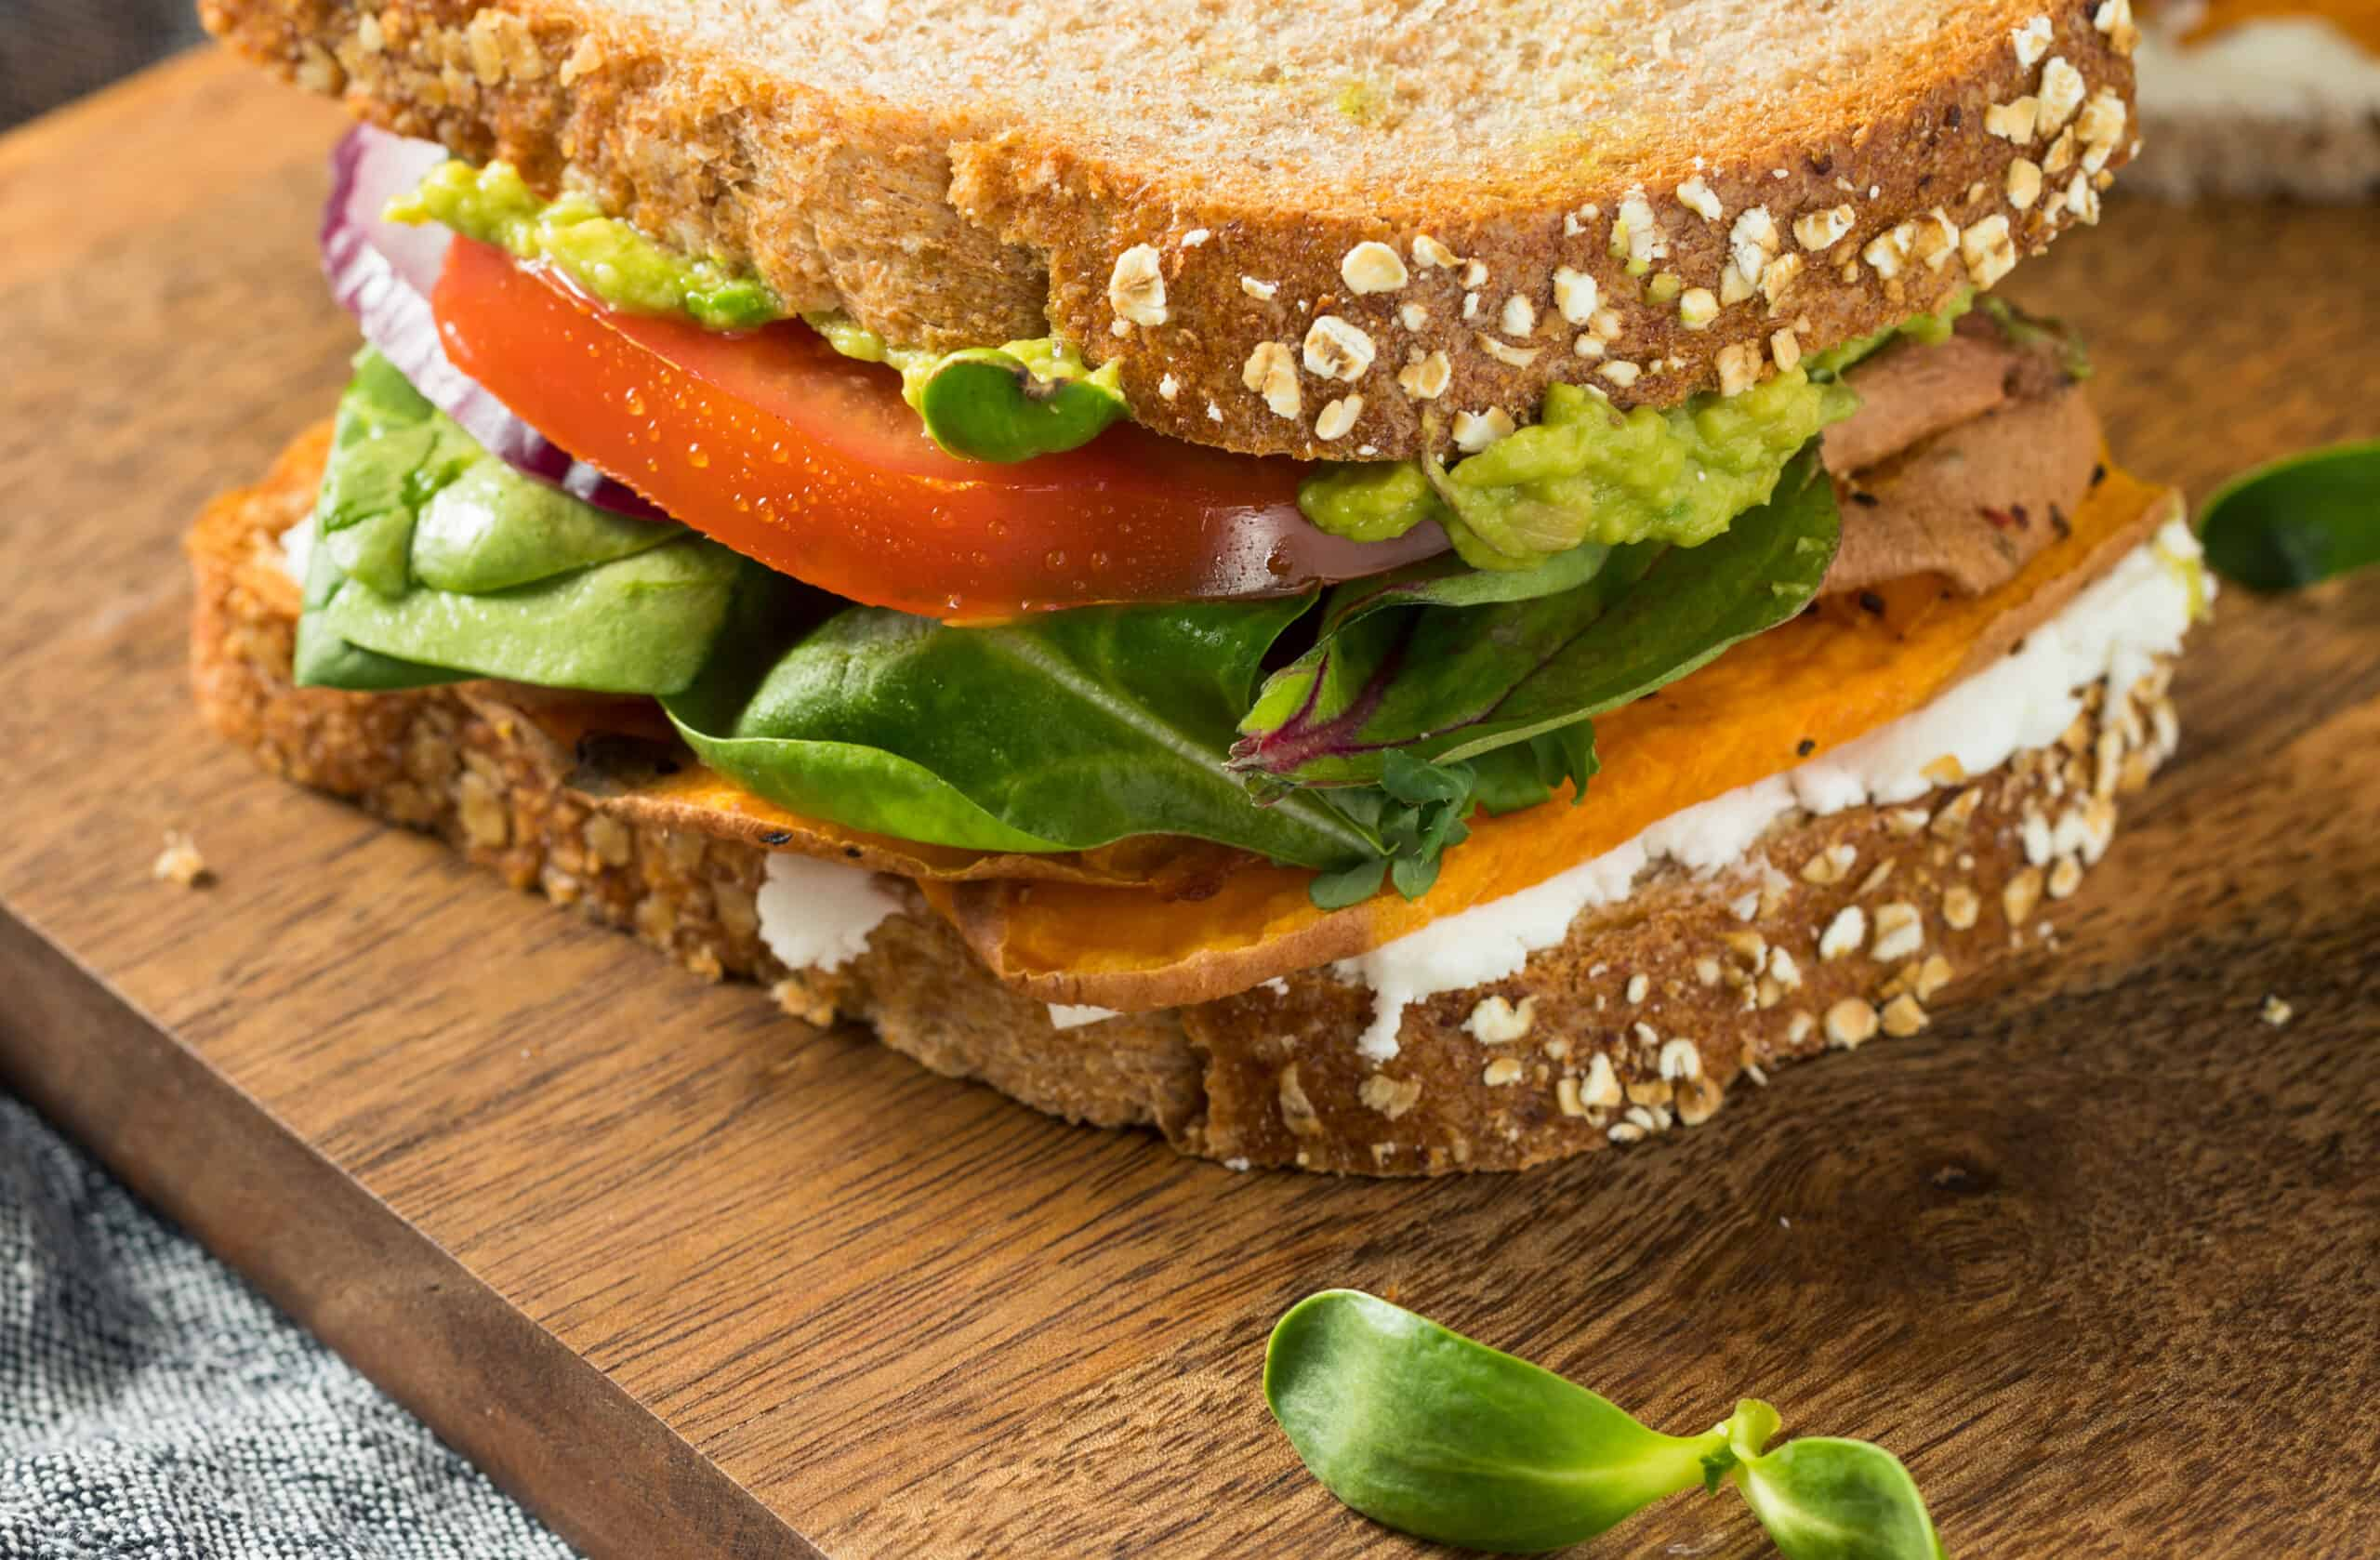 Gut friendly sandwich recipe suggestion